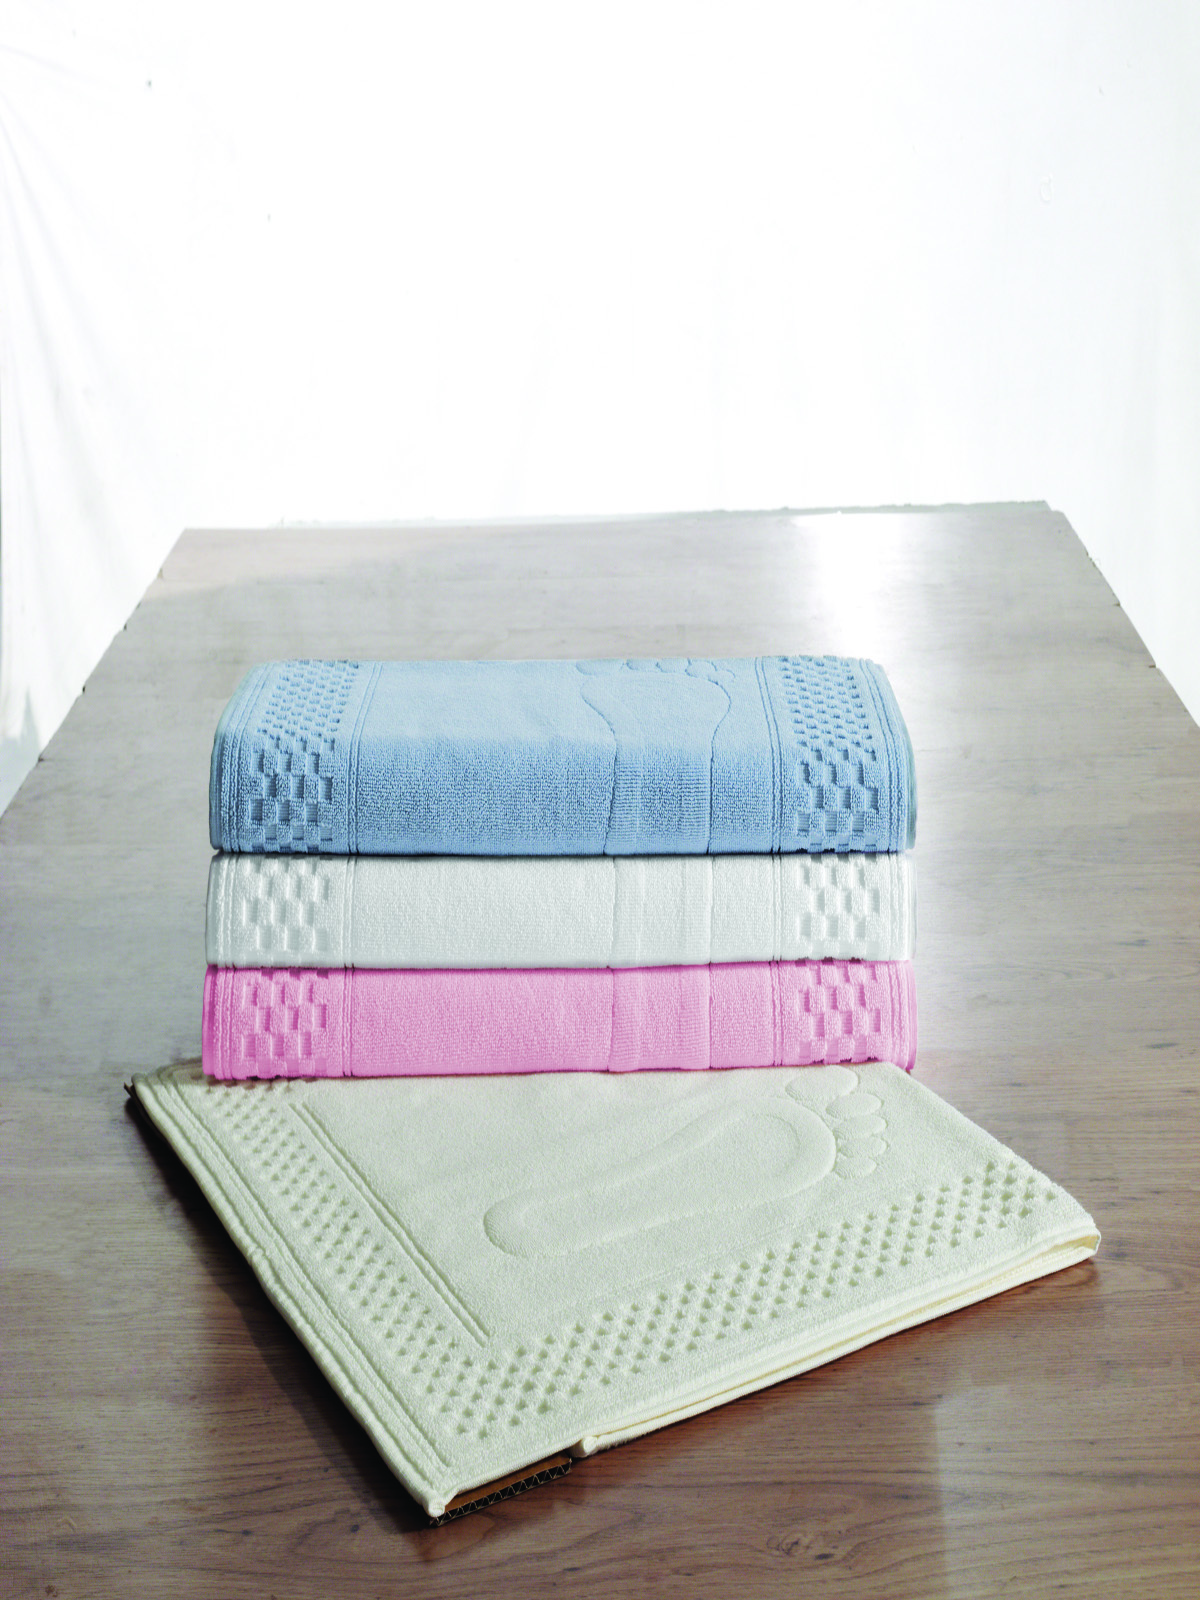 Коврики Коврик  для ванной 50х90  STEP СТЕП  Soft cotton Турция Step.JPG